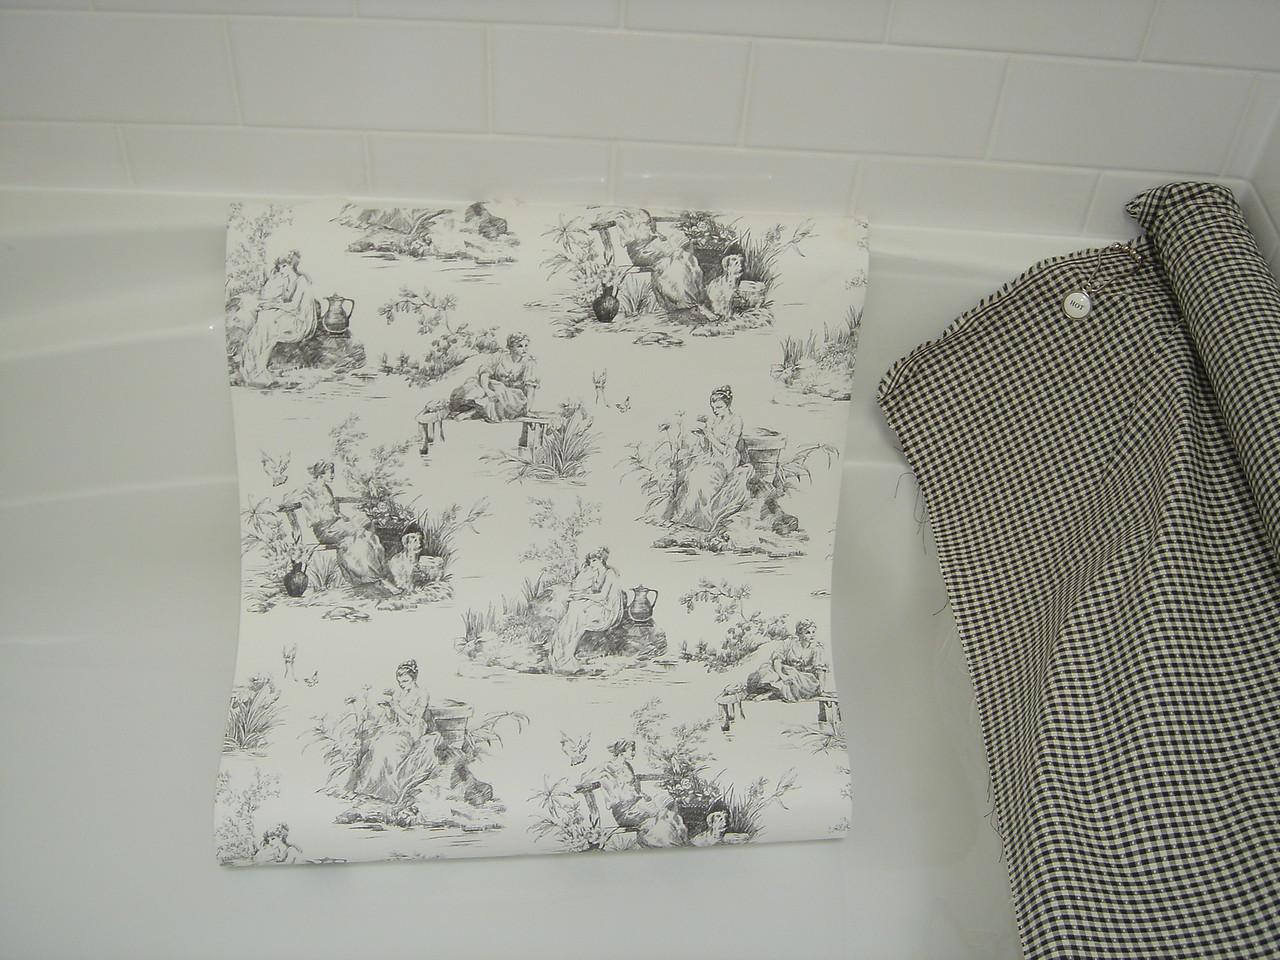 wallpaper & shower curtain fabric